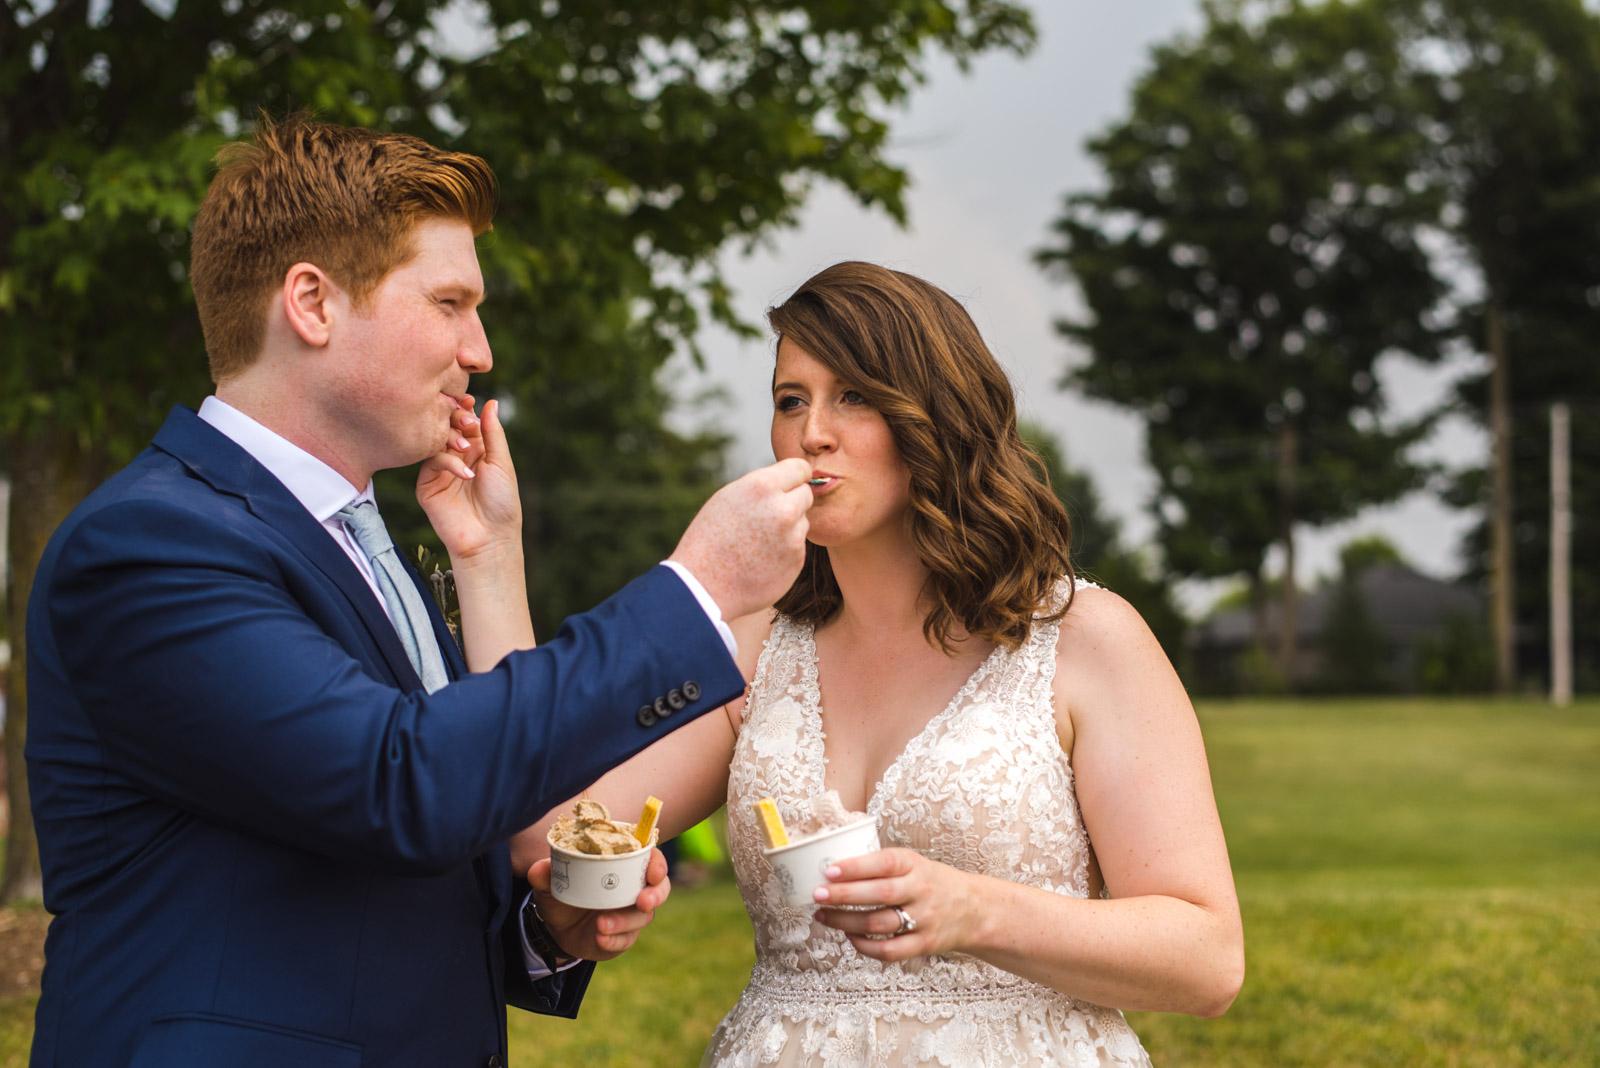 Emerson & Elicia's Golf Course Wedding Aidan & Leanne Hennebry Hamilton Wedding Videographers Photographers Niagara Hush Hush Photography & Film-33.jpg